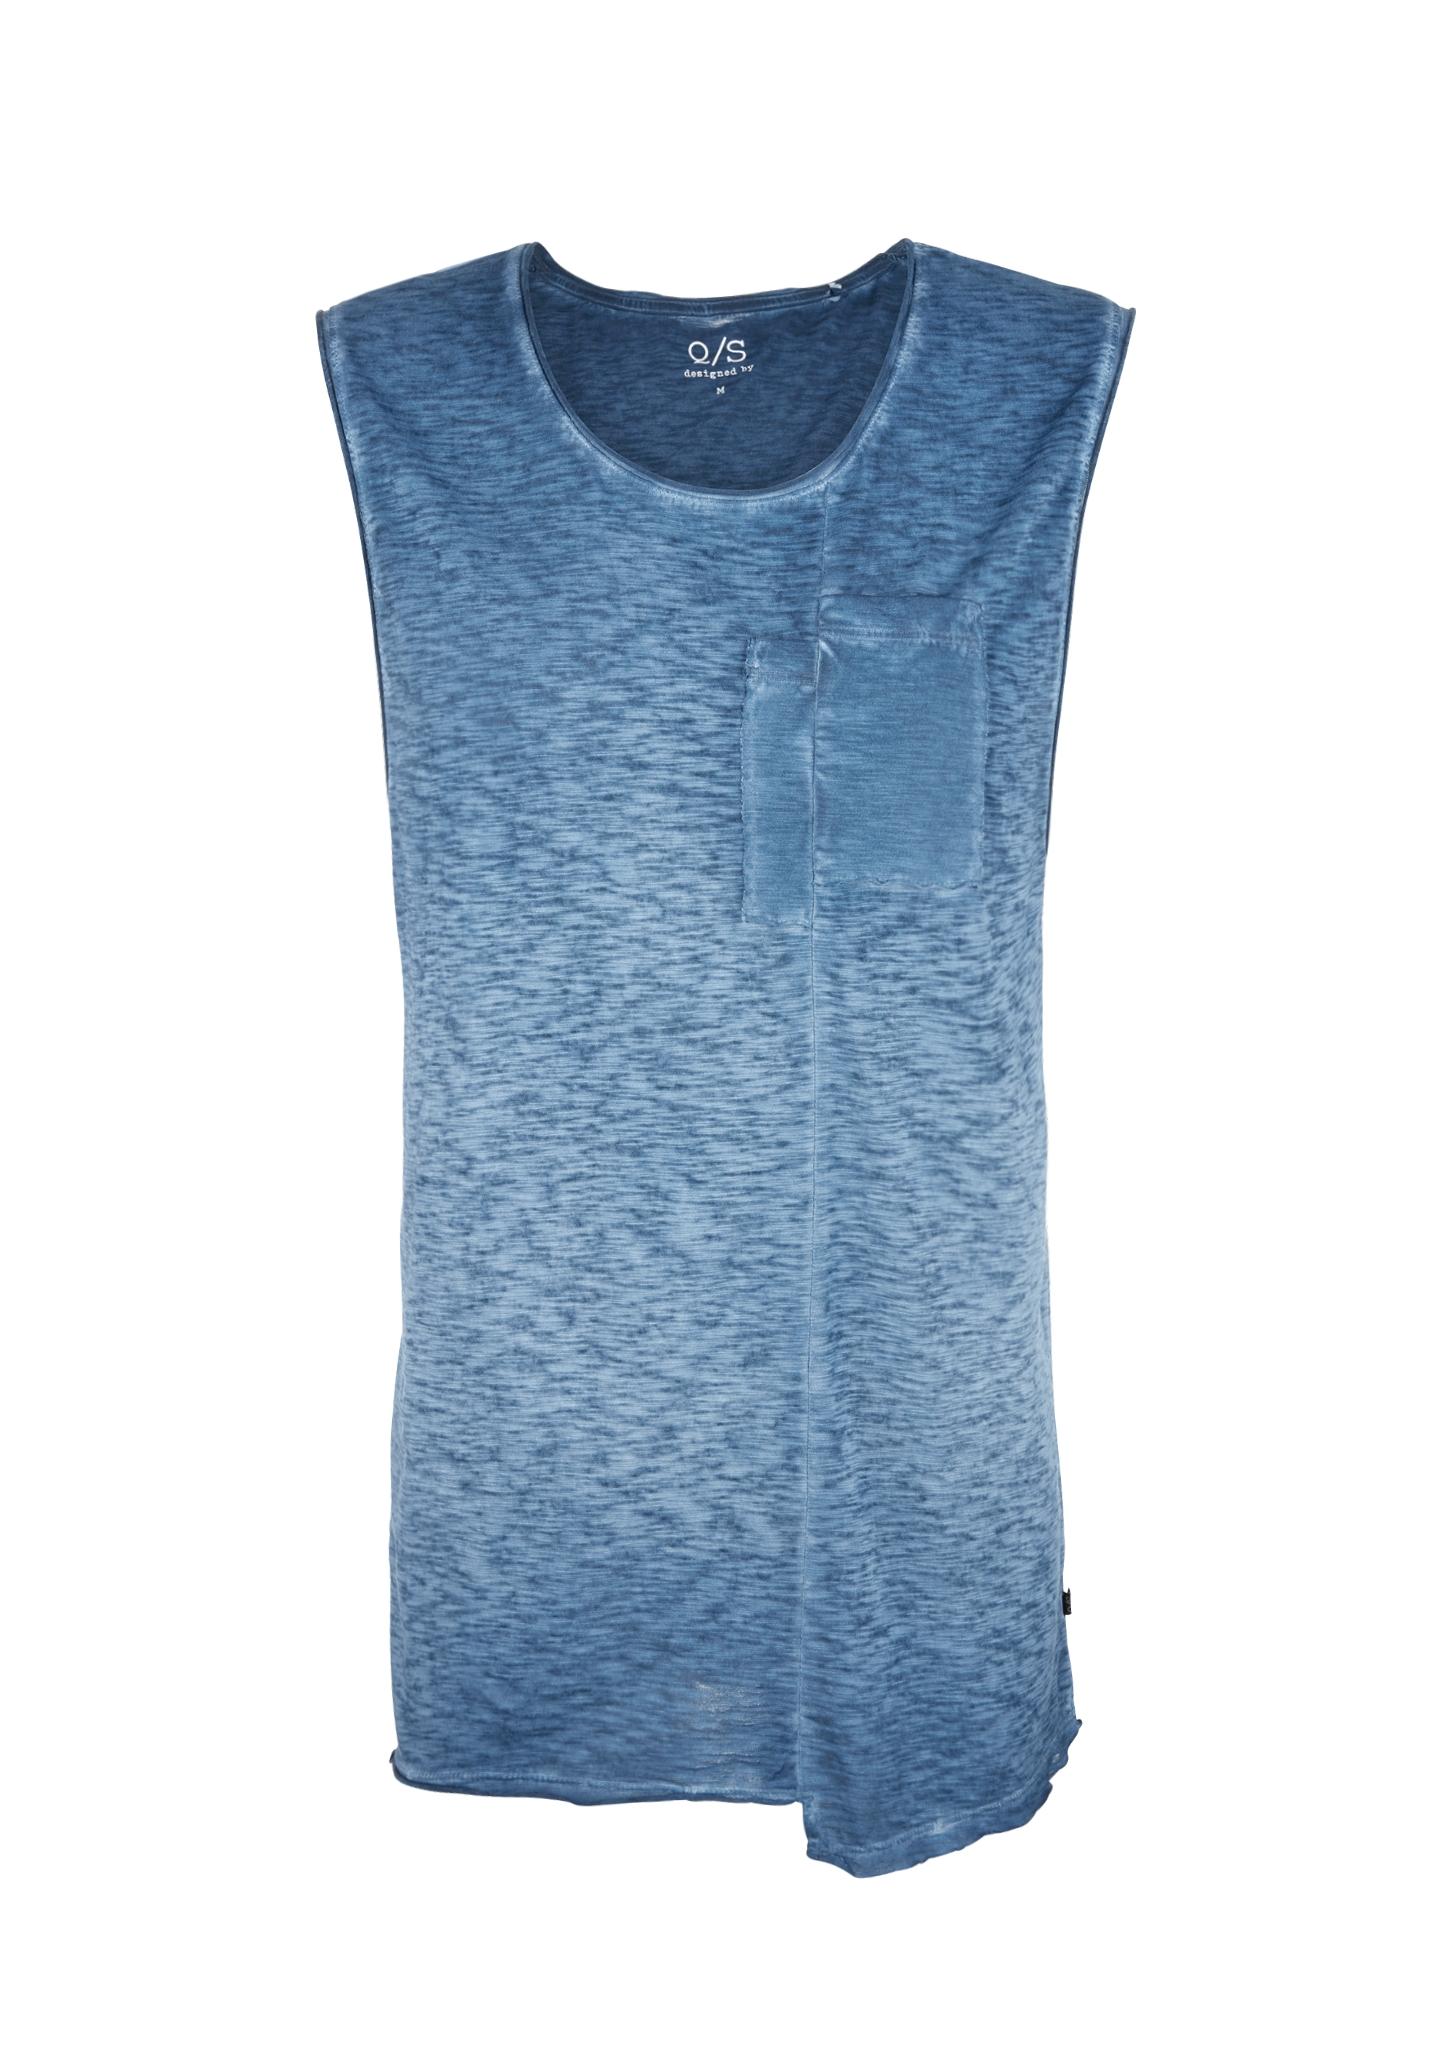 Tanktop | Sportbekleidung > Tanktops | Blau | 100% baumwolle | Q/S designed by